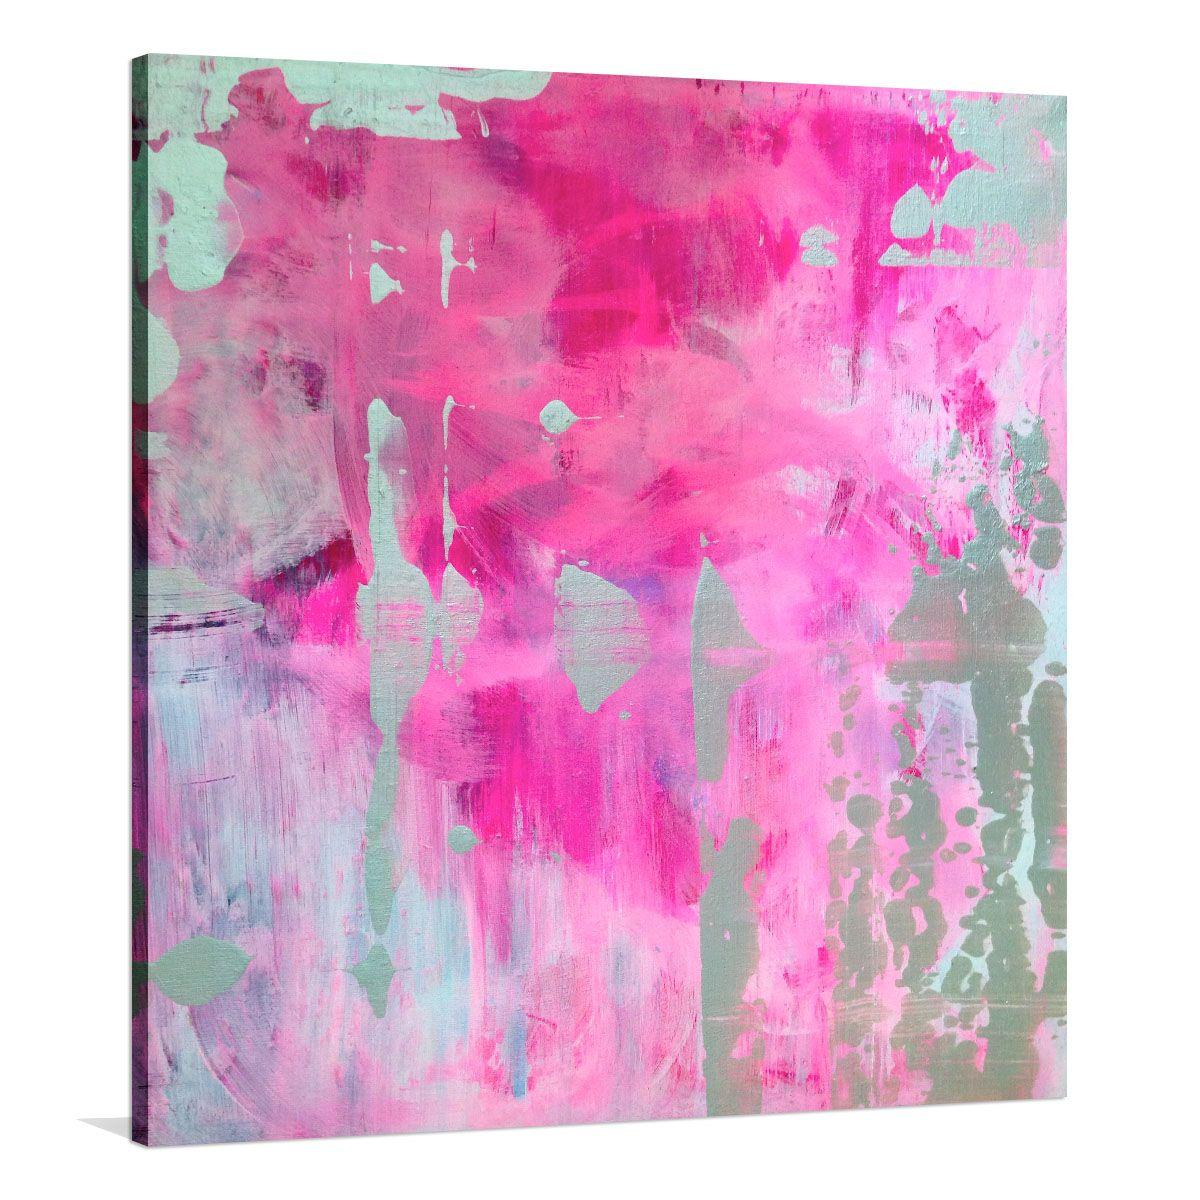 Summer rain canvas print buy australian made canvas print for Buy canvas prints online